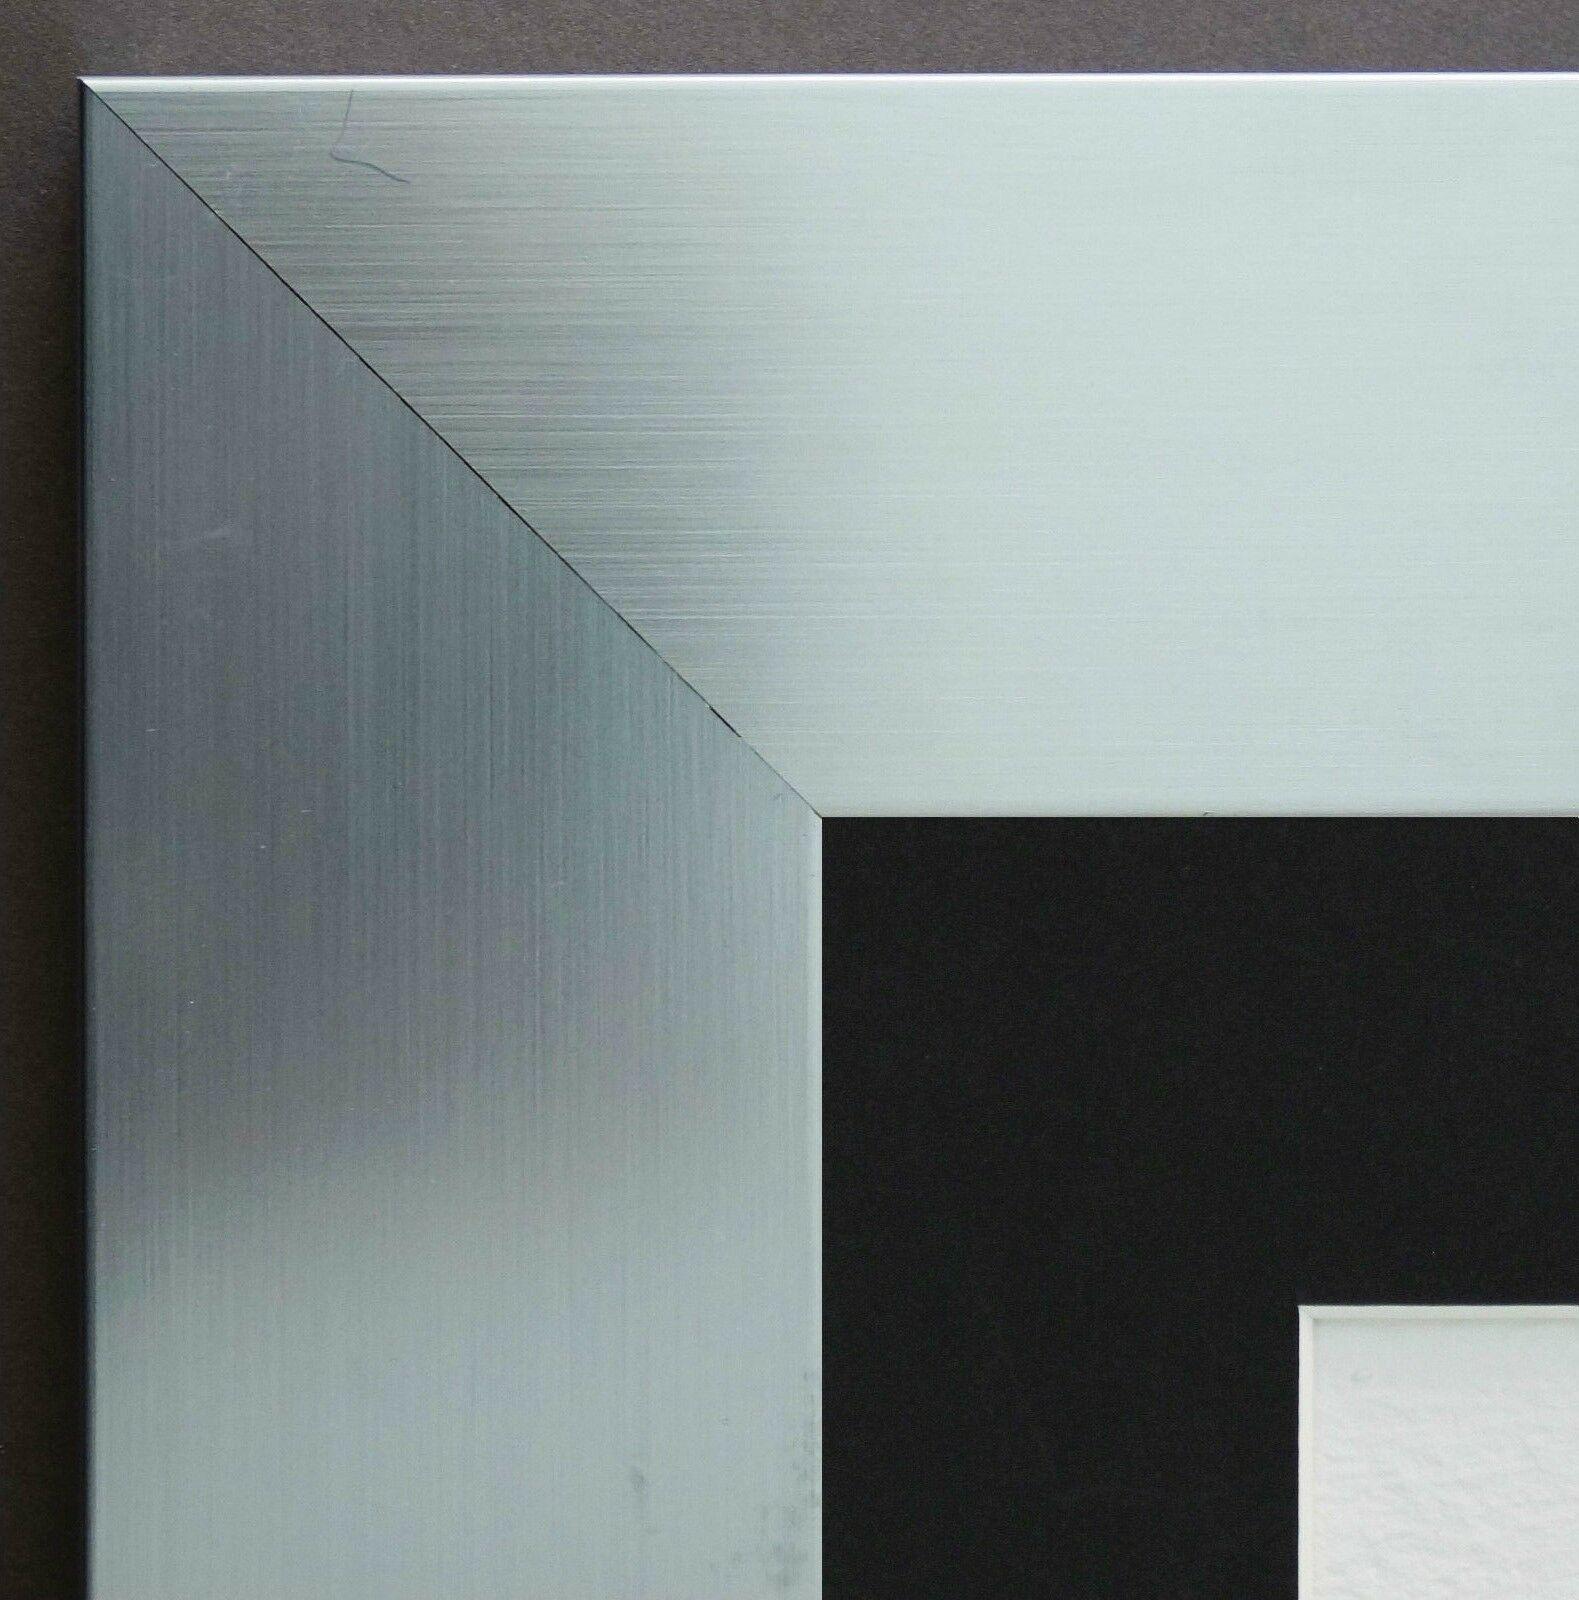 Bilderrahmen novara in silber modern passepartout in - Moderne bilderrahmen ...